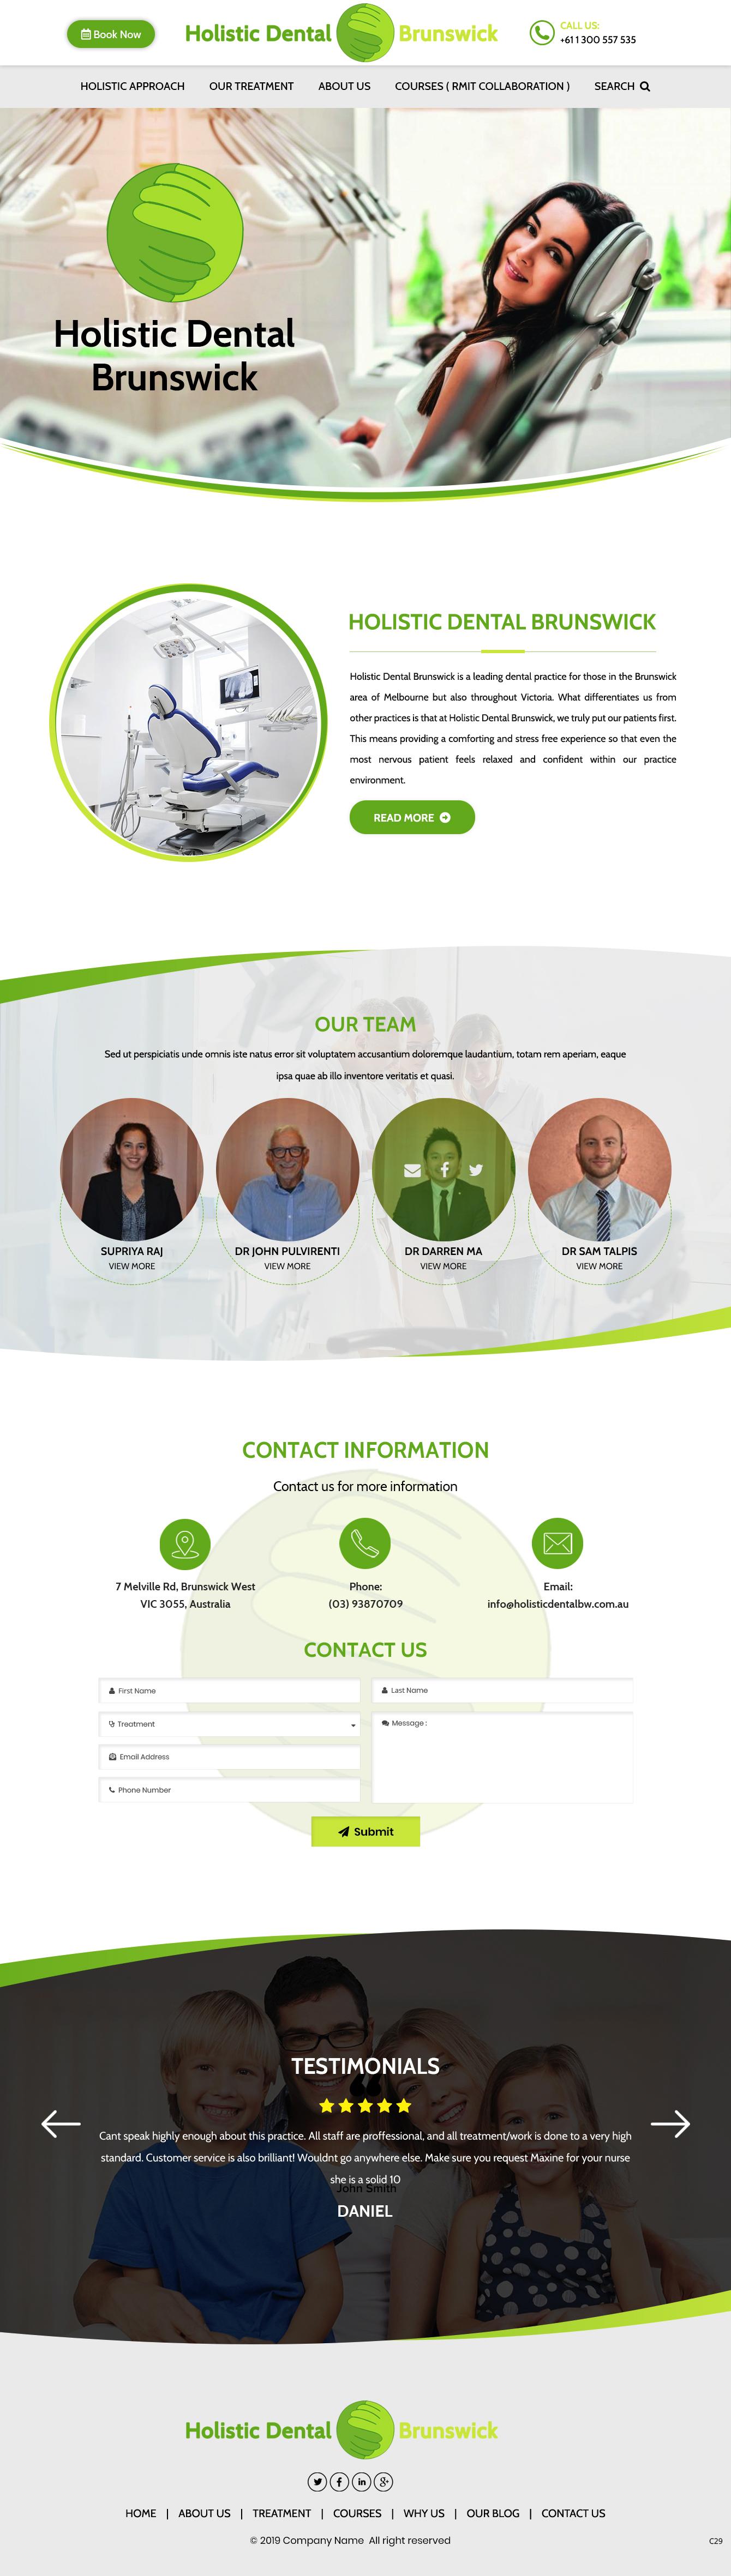 Web Design For A Company By Pb Design 21629625